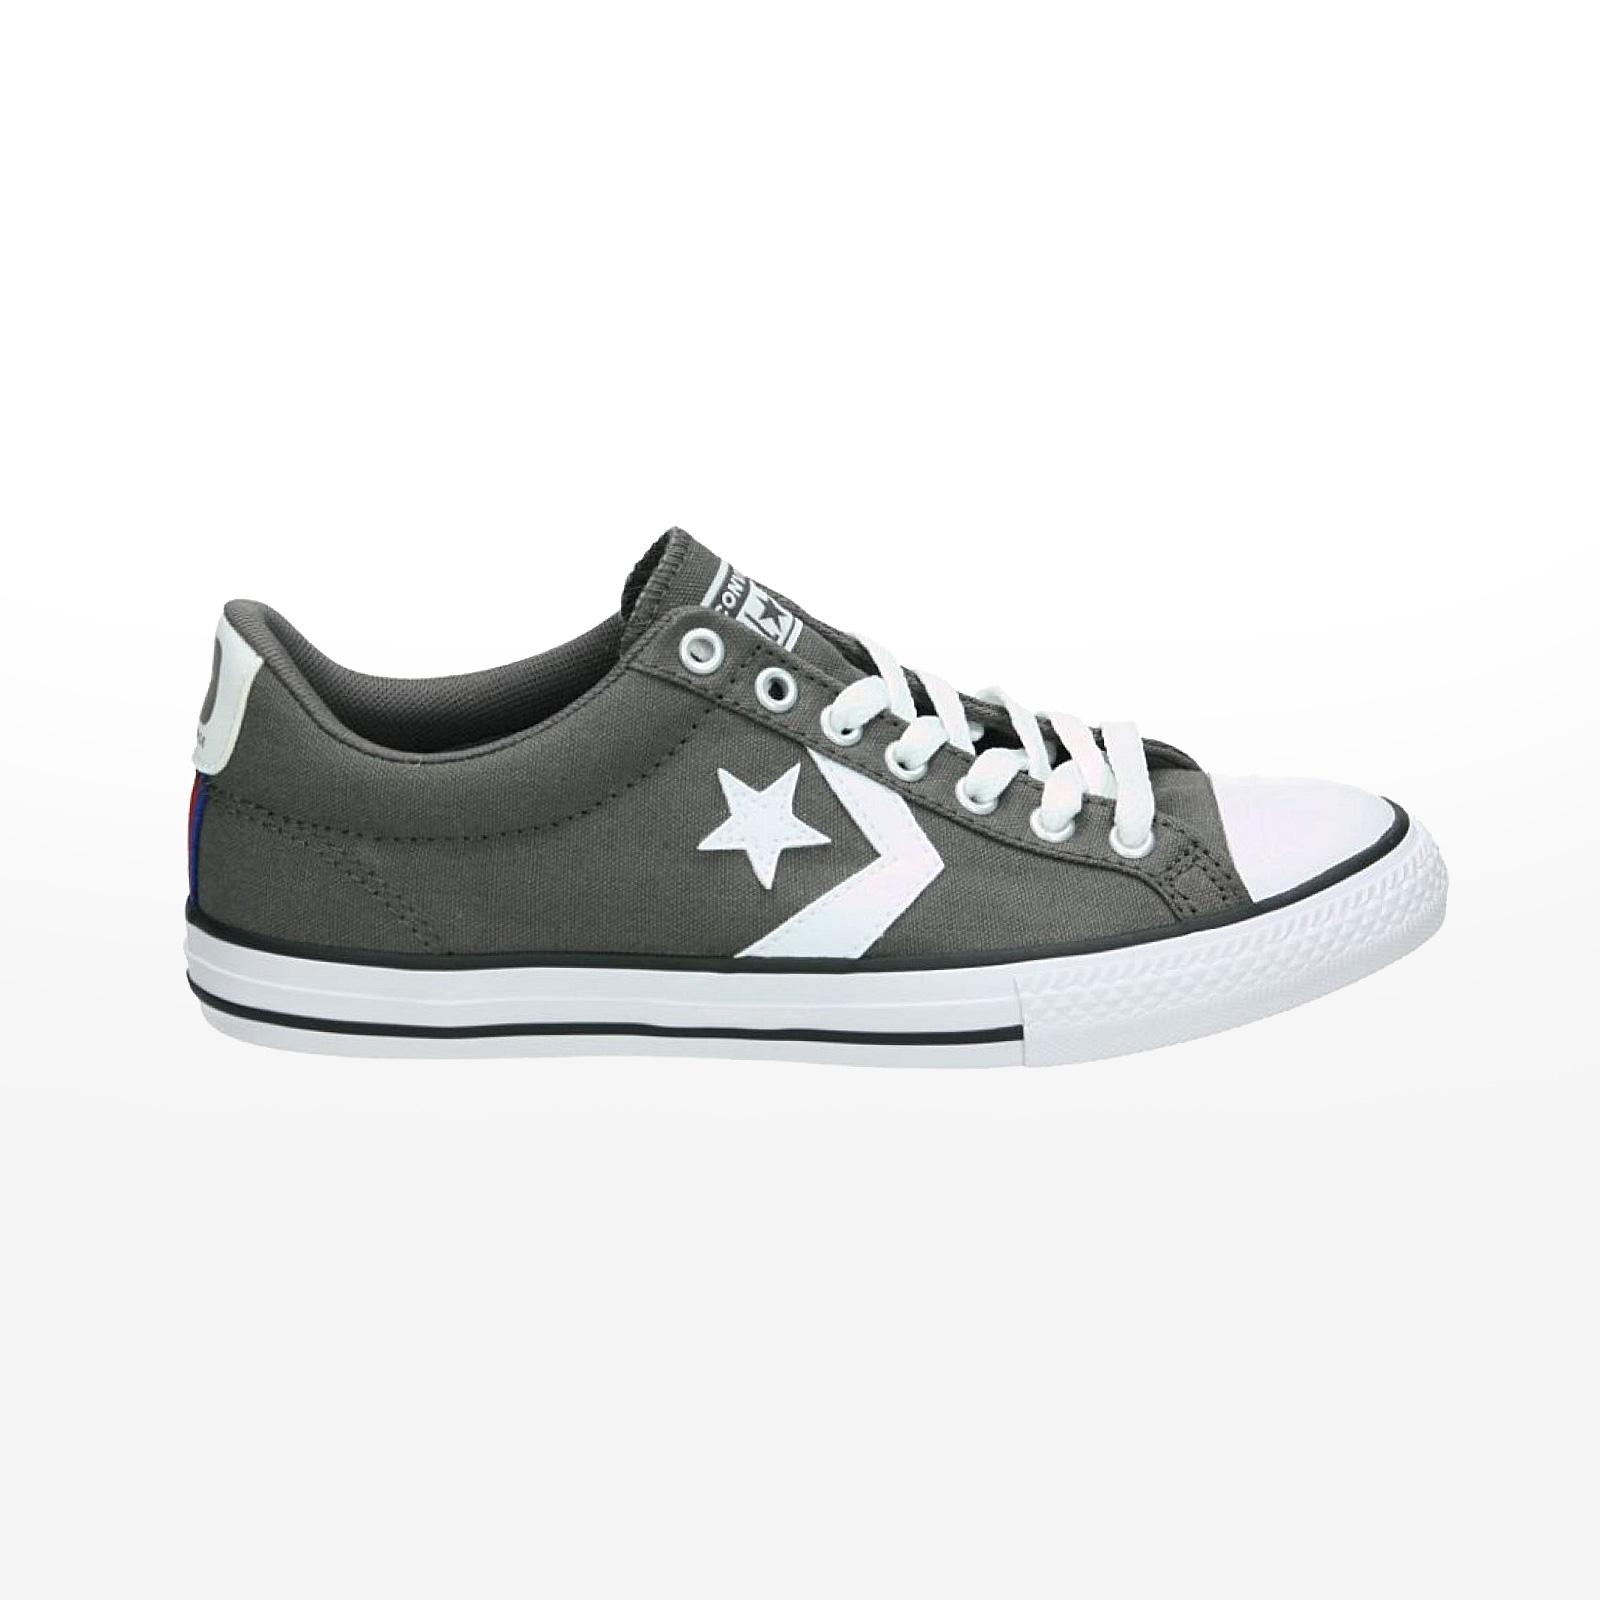 cheap for discount 45320 a26a1 Sportcafe Converse – 663655C STAR PLAYER EV OX FOOTWEAR – 030 00G4